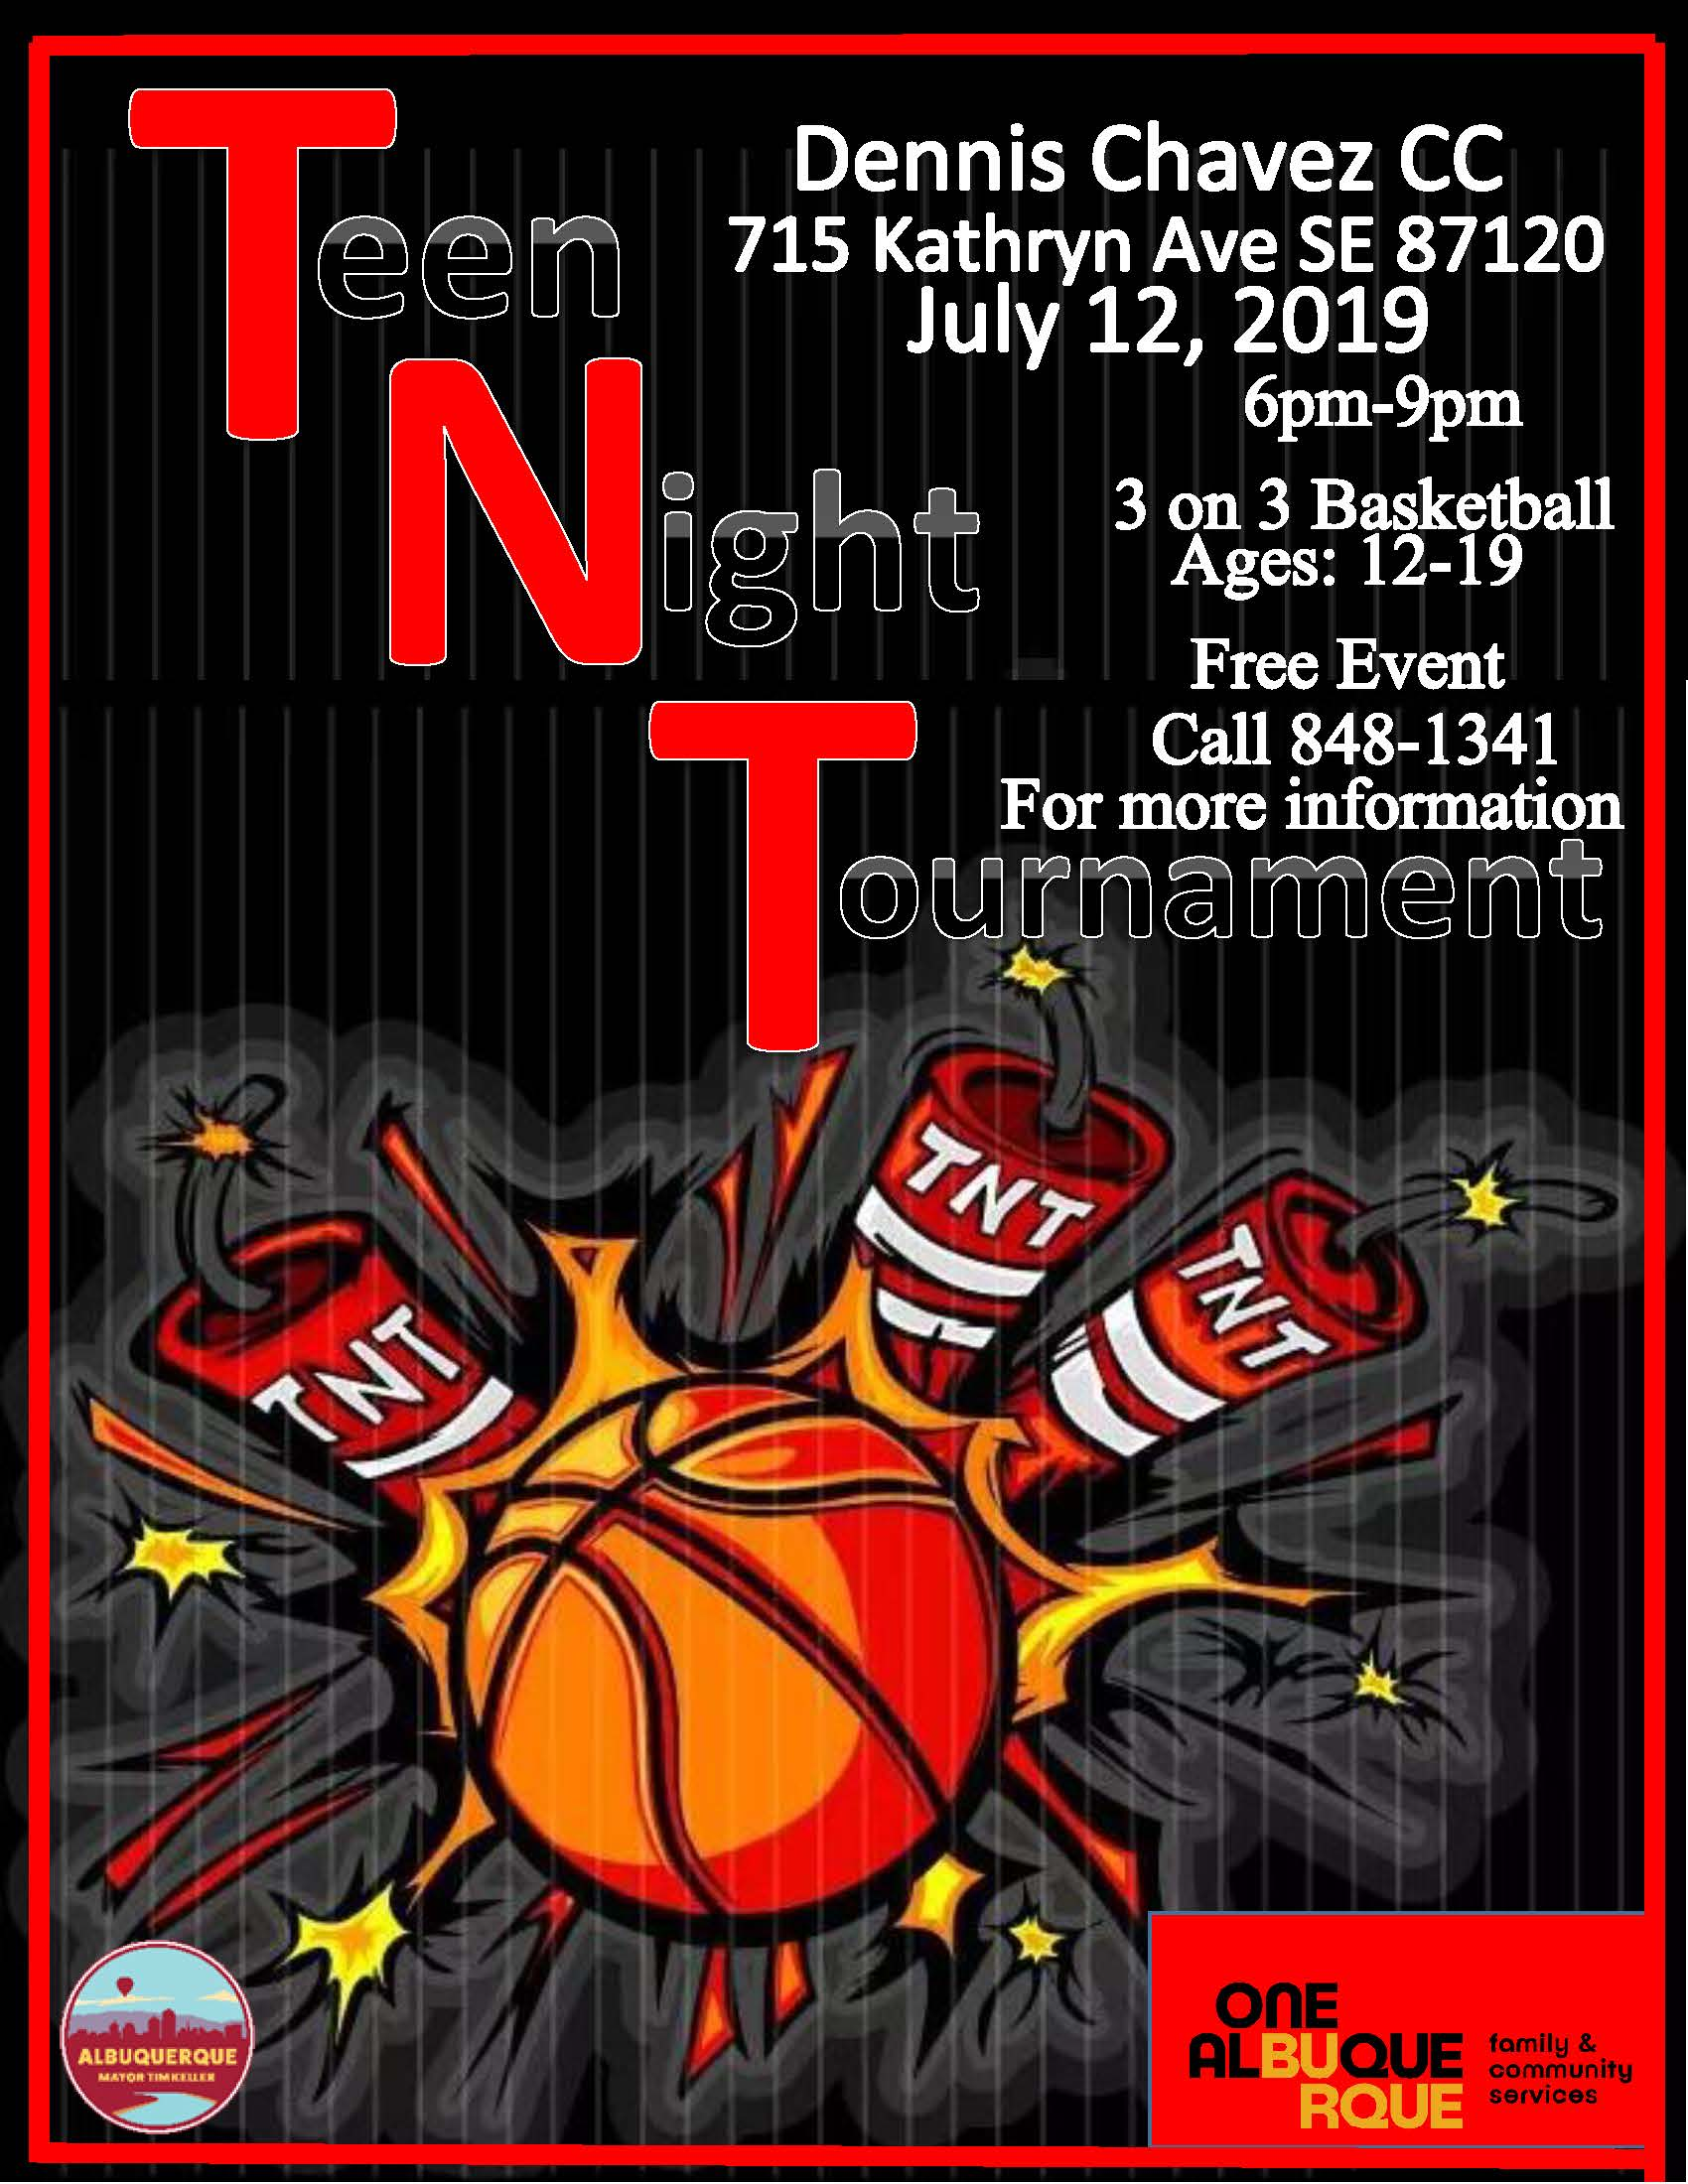 Teen Nights 2019 Basket Ball Tournaments Flyer